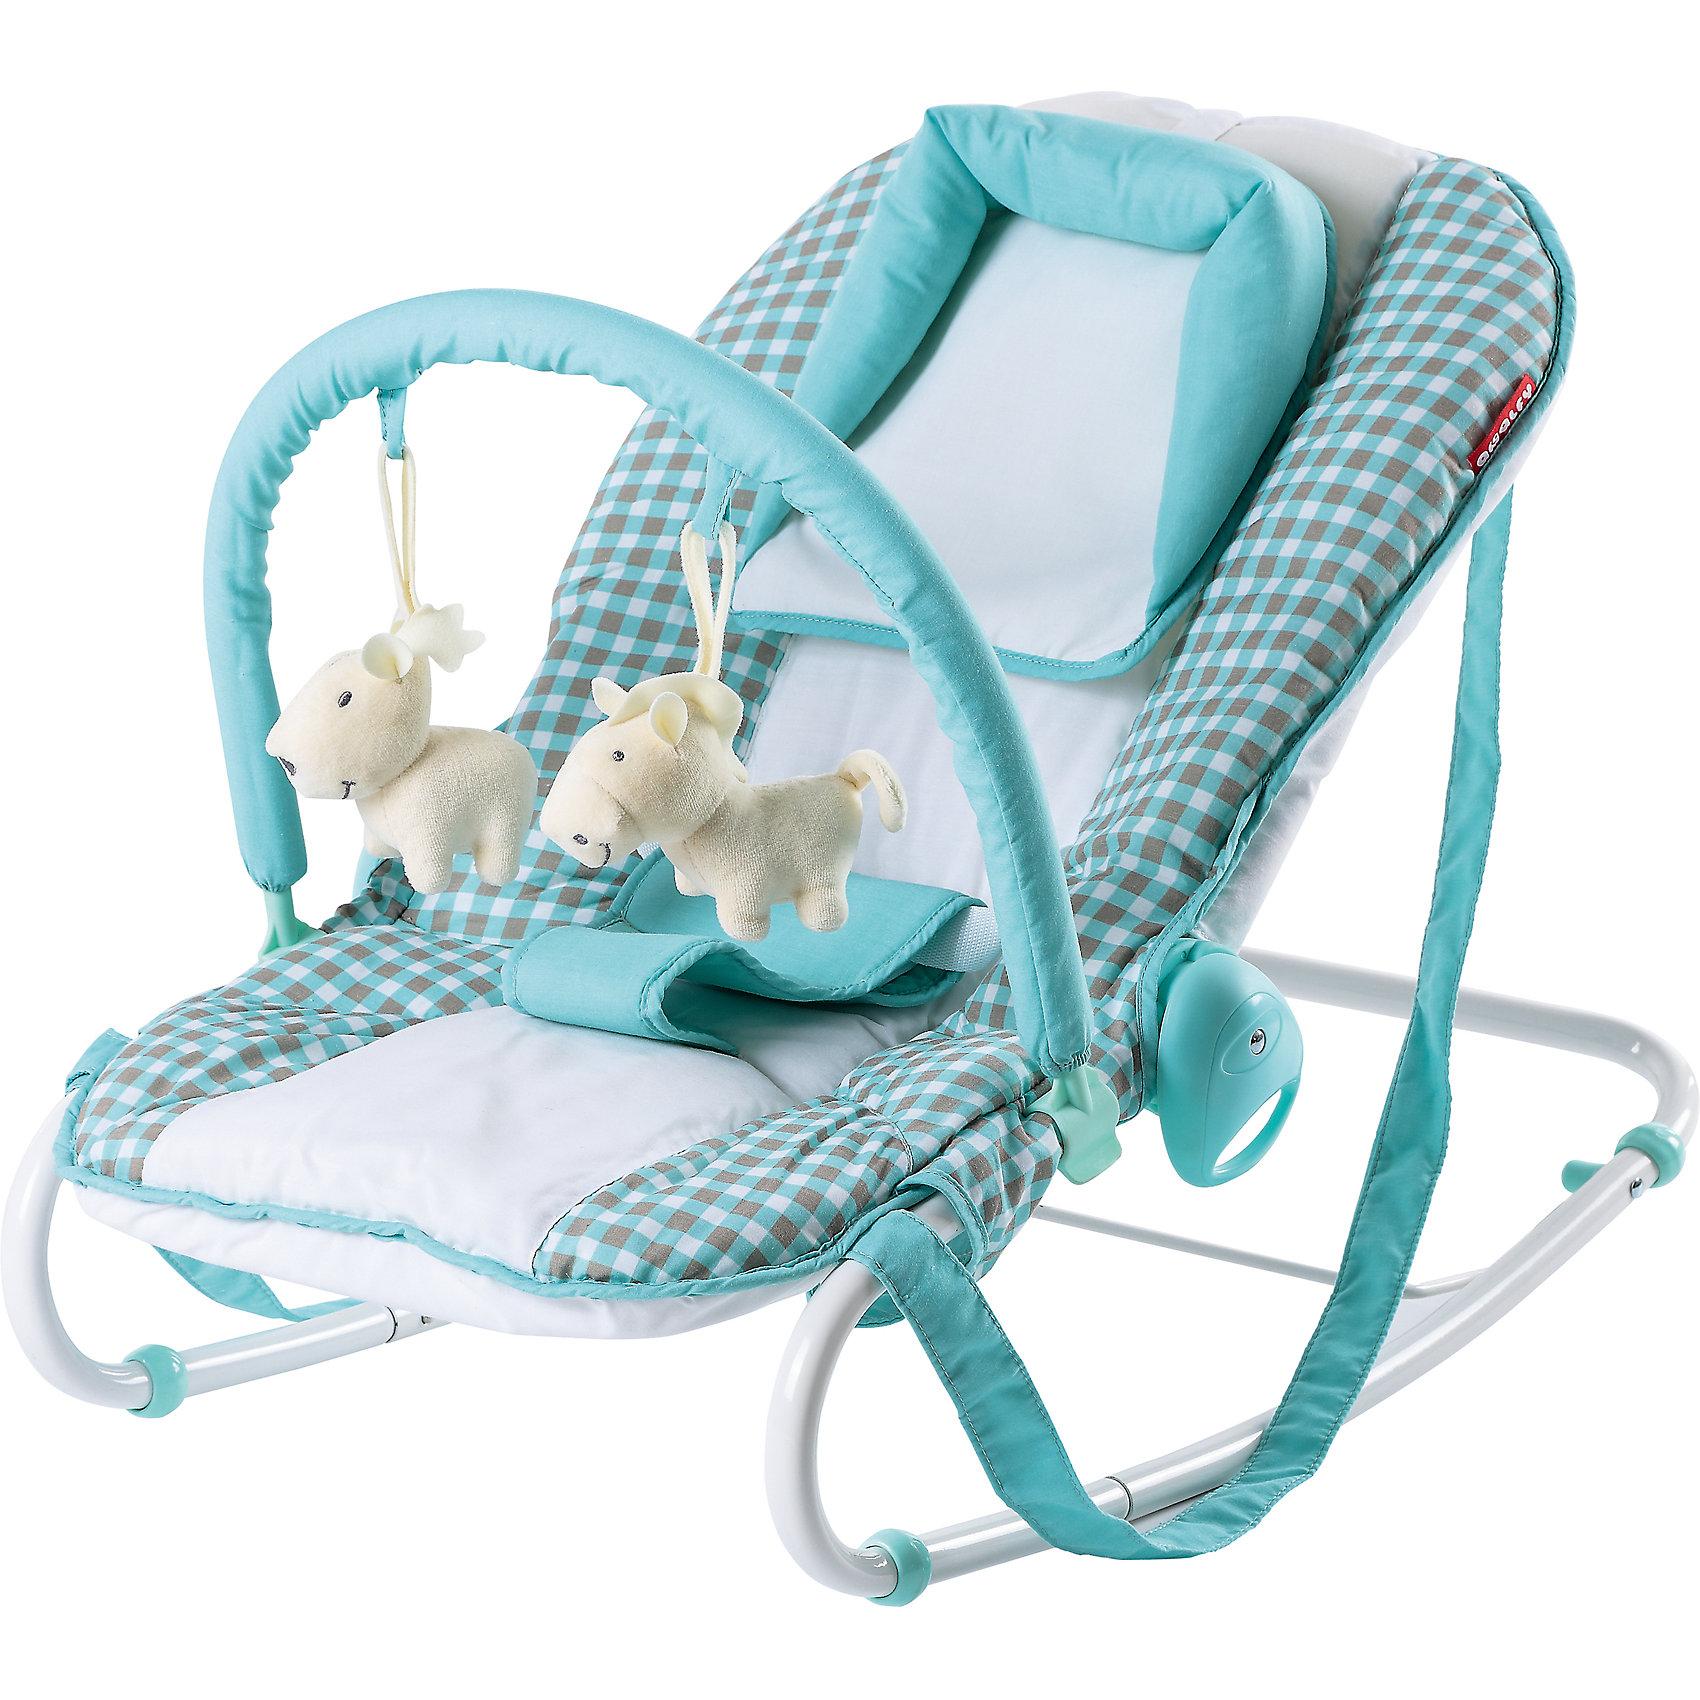 Шезлонг Amalfy НB-8023 Т, Happy Baby, aqva